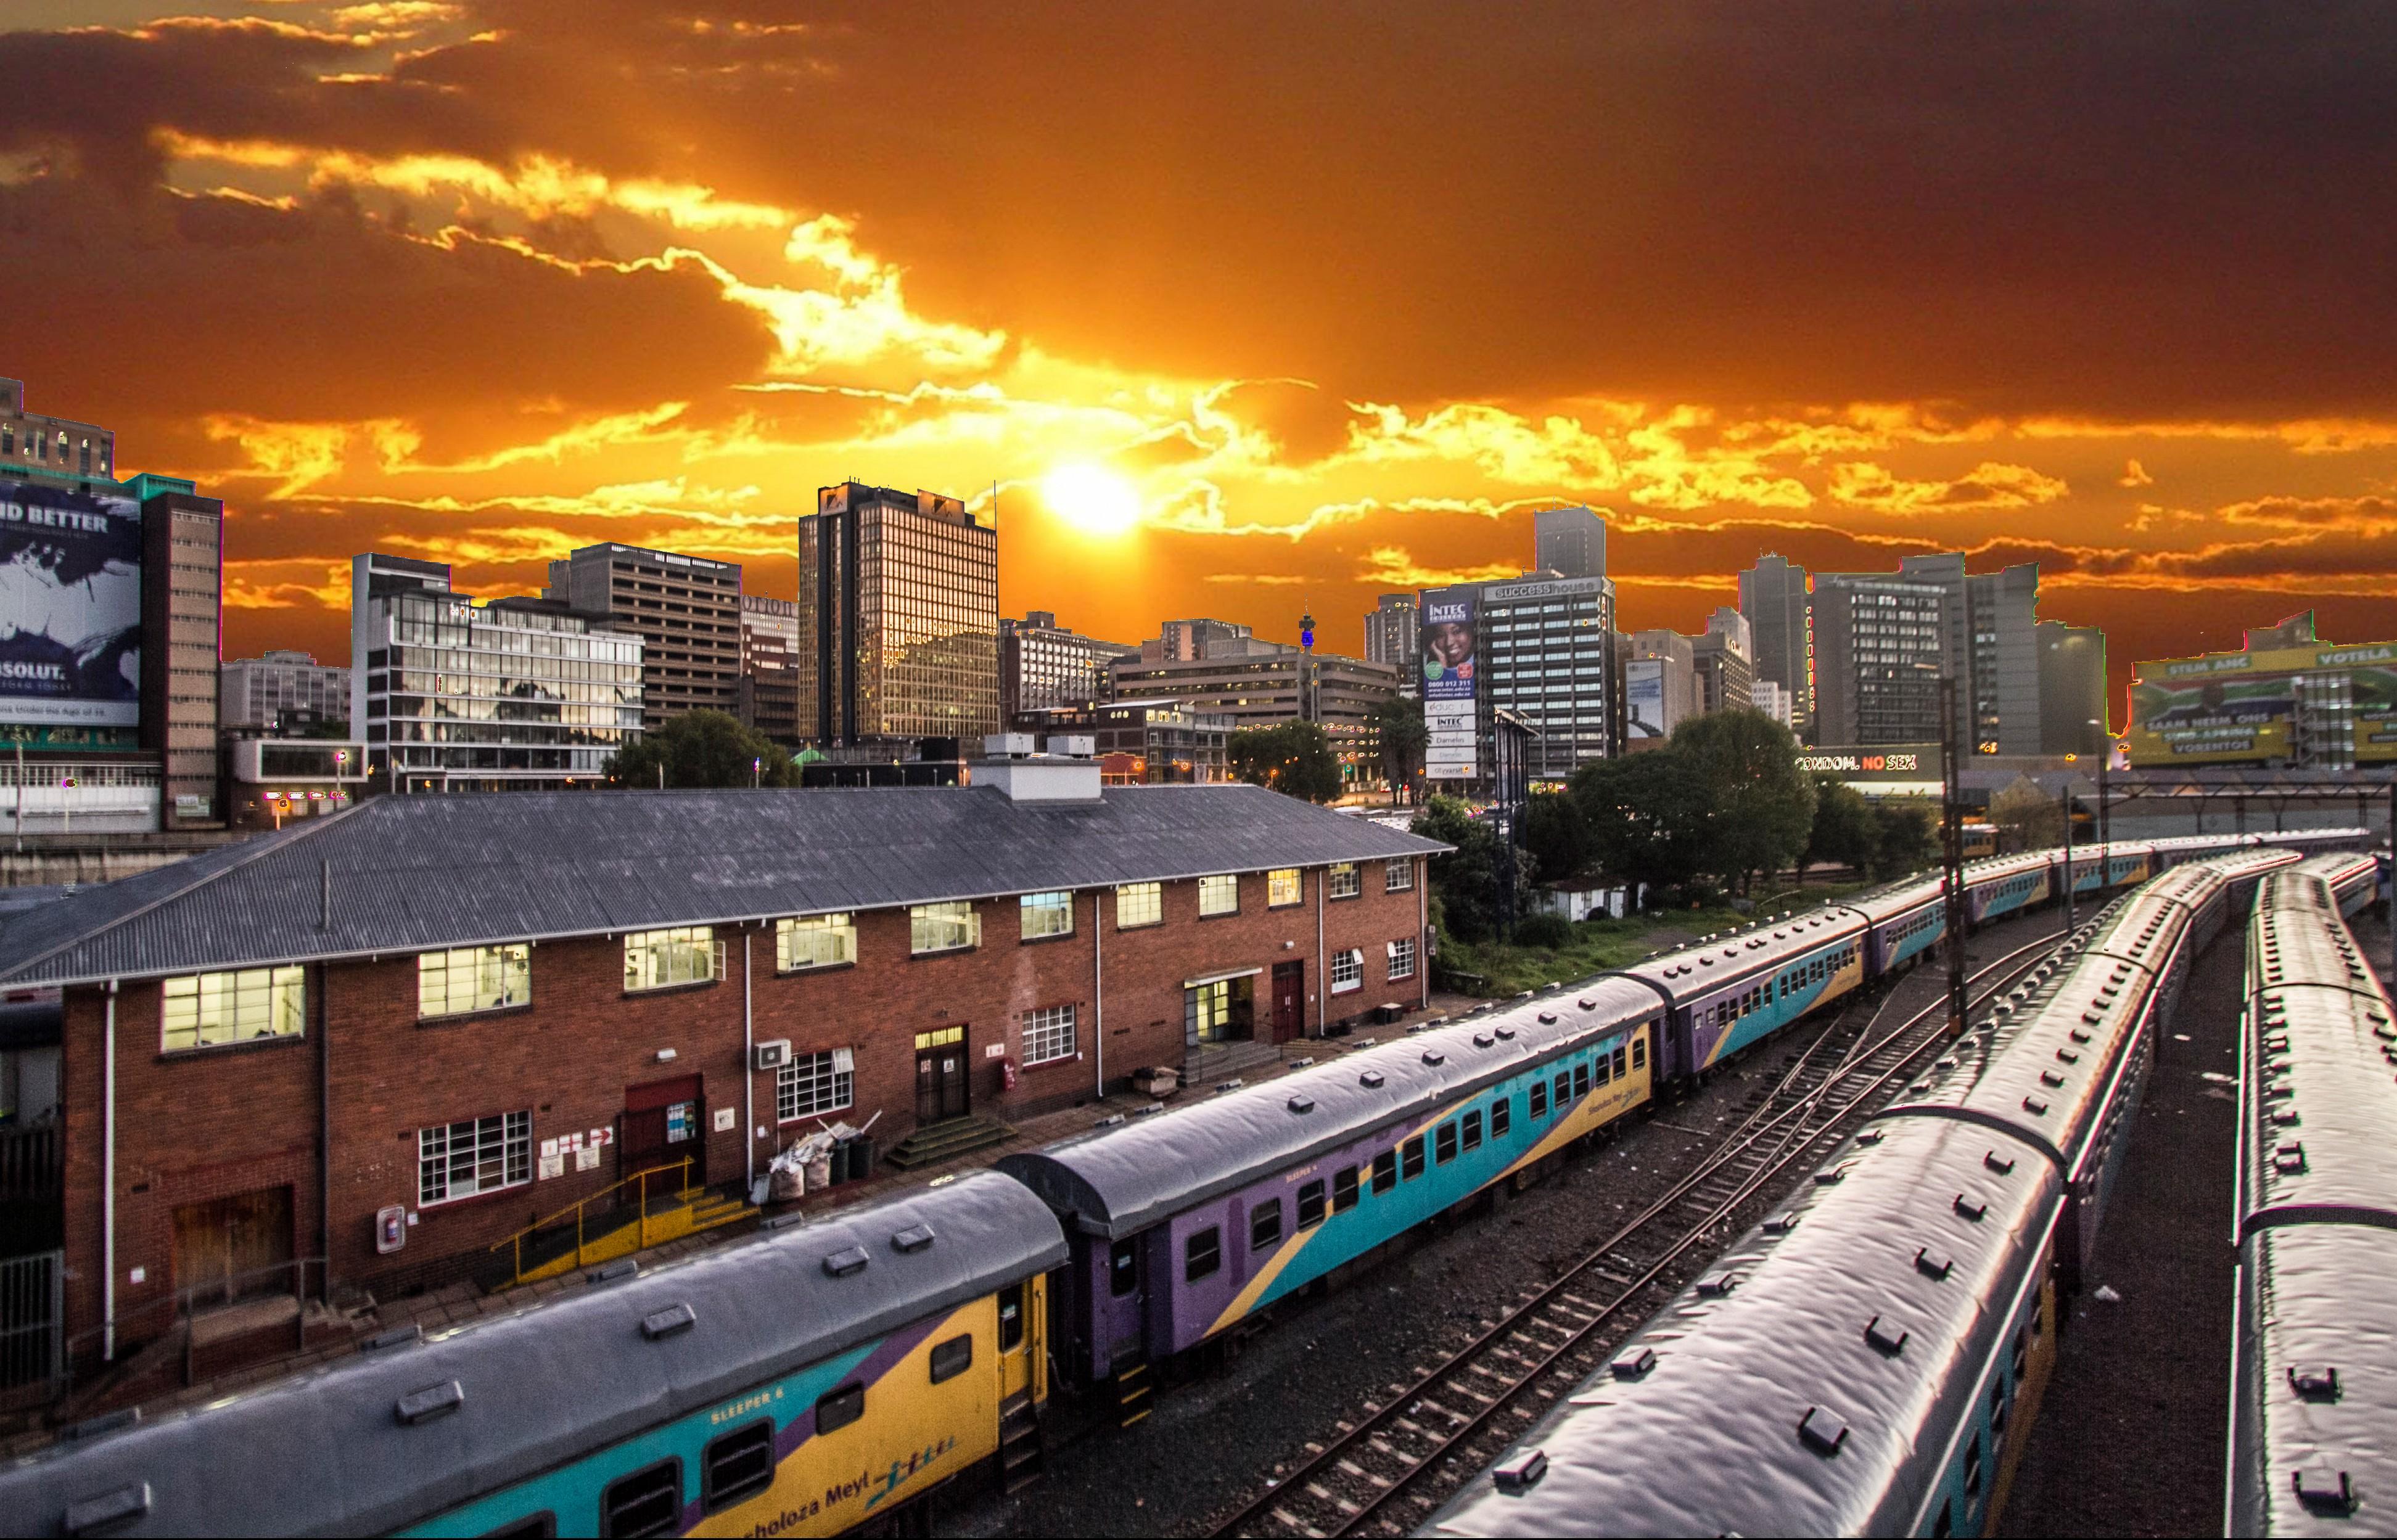 Shining a Spotlight on Johannesburg's Urban Renewal Projects